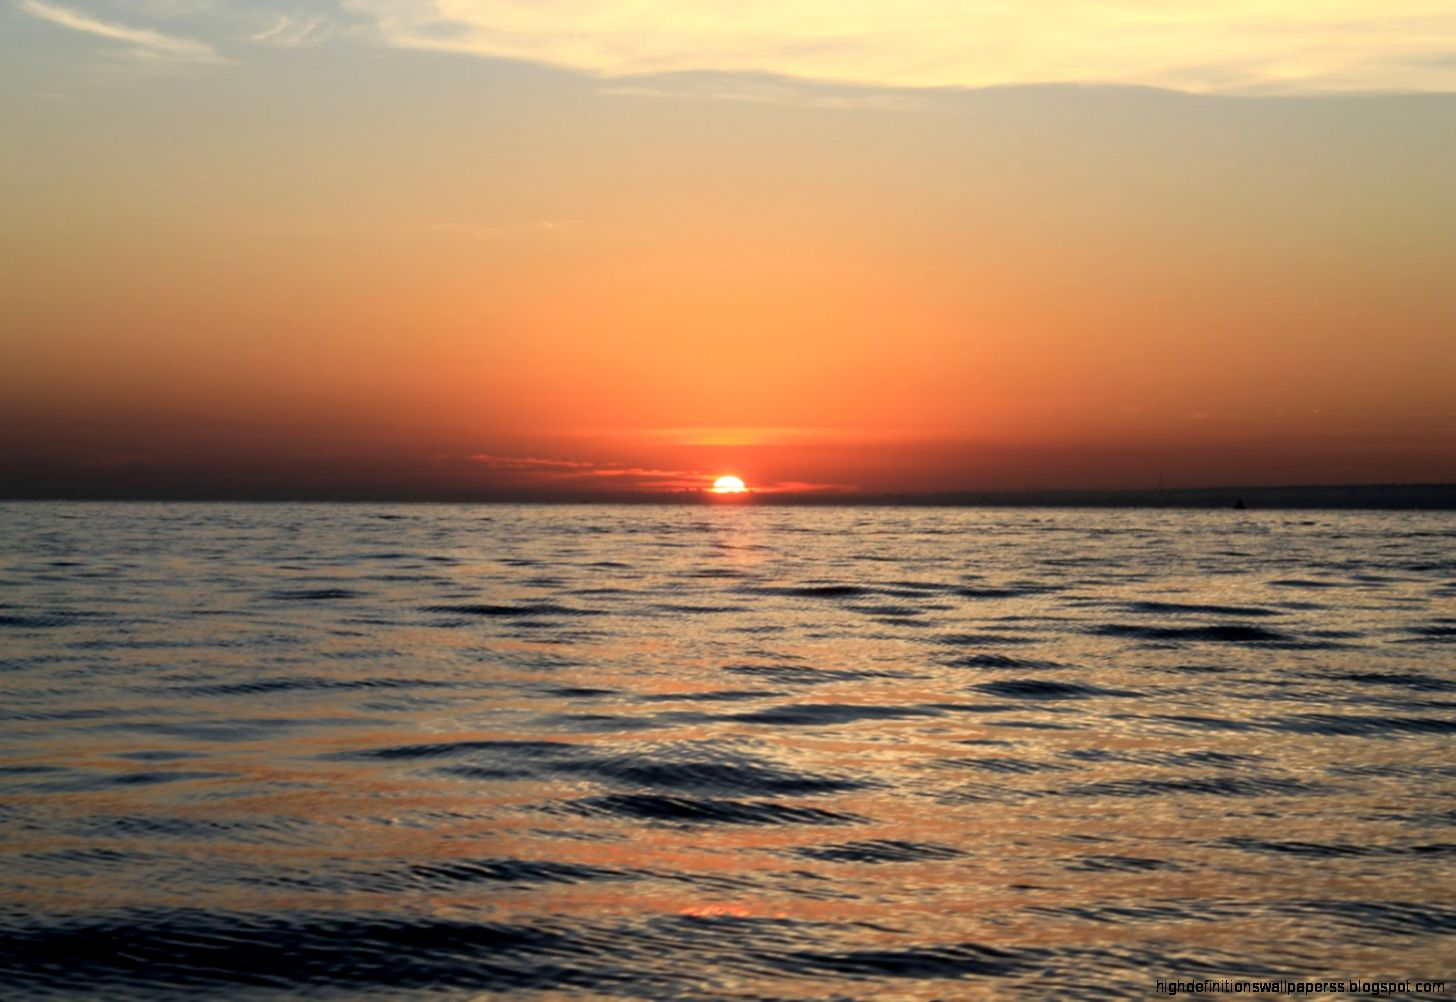 Sunset Kalibukbuk Tourism Lovina Beach Hd Wallpaper ...